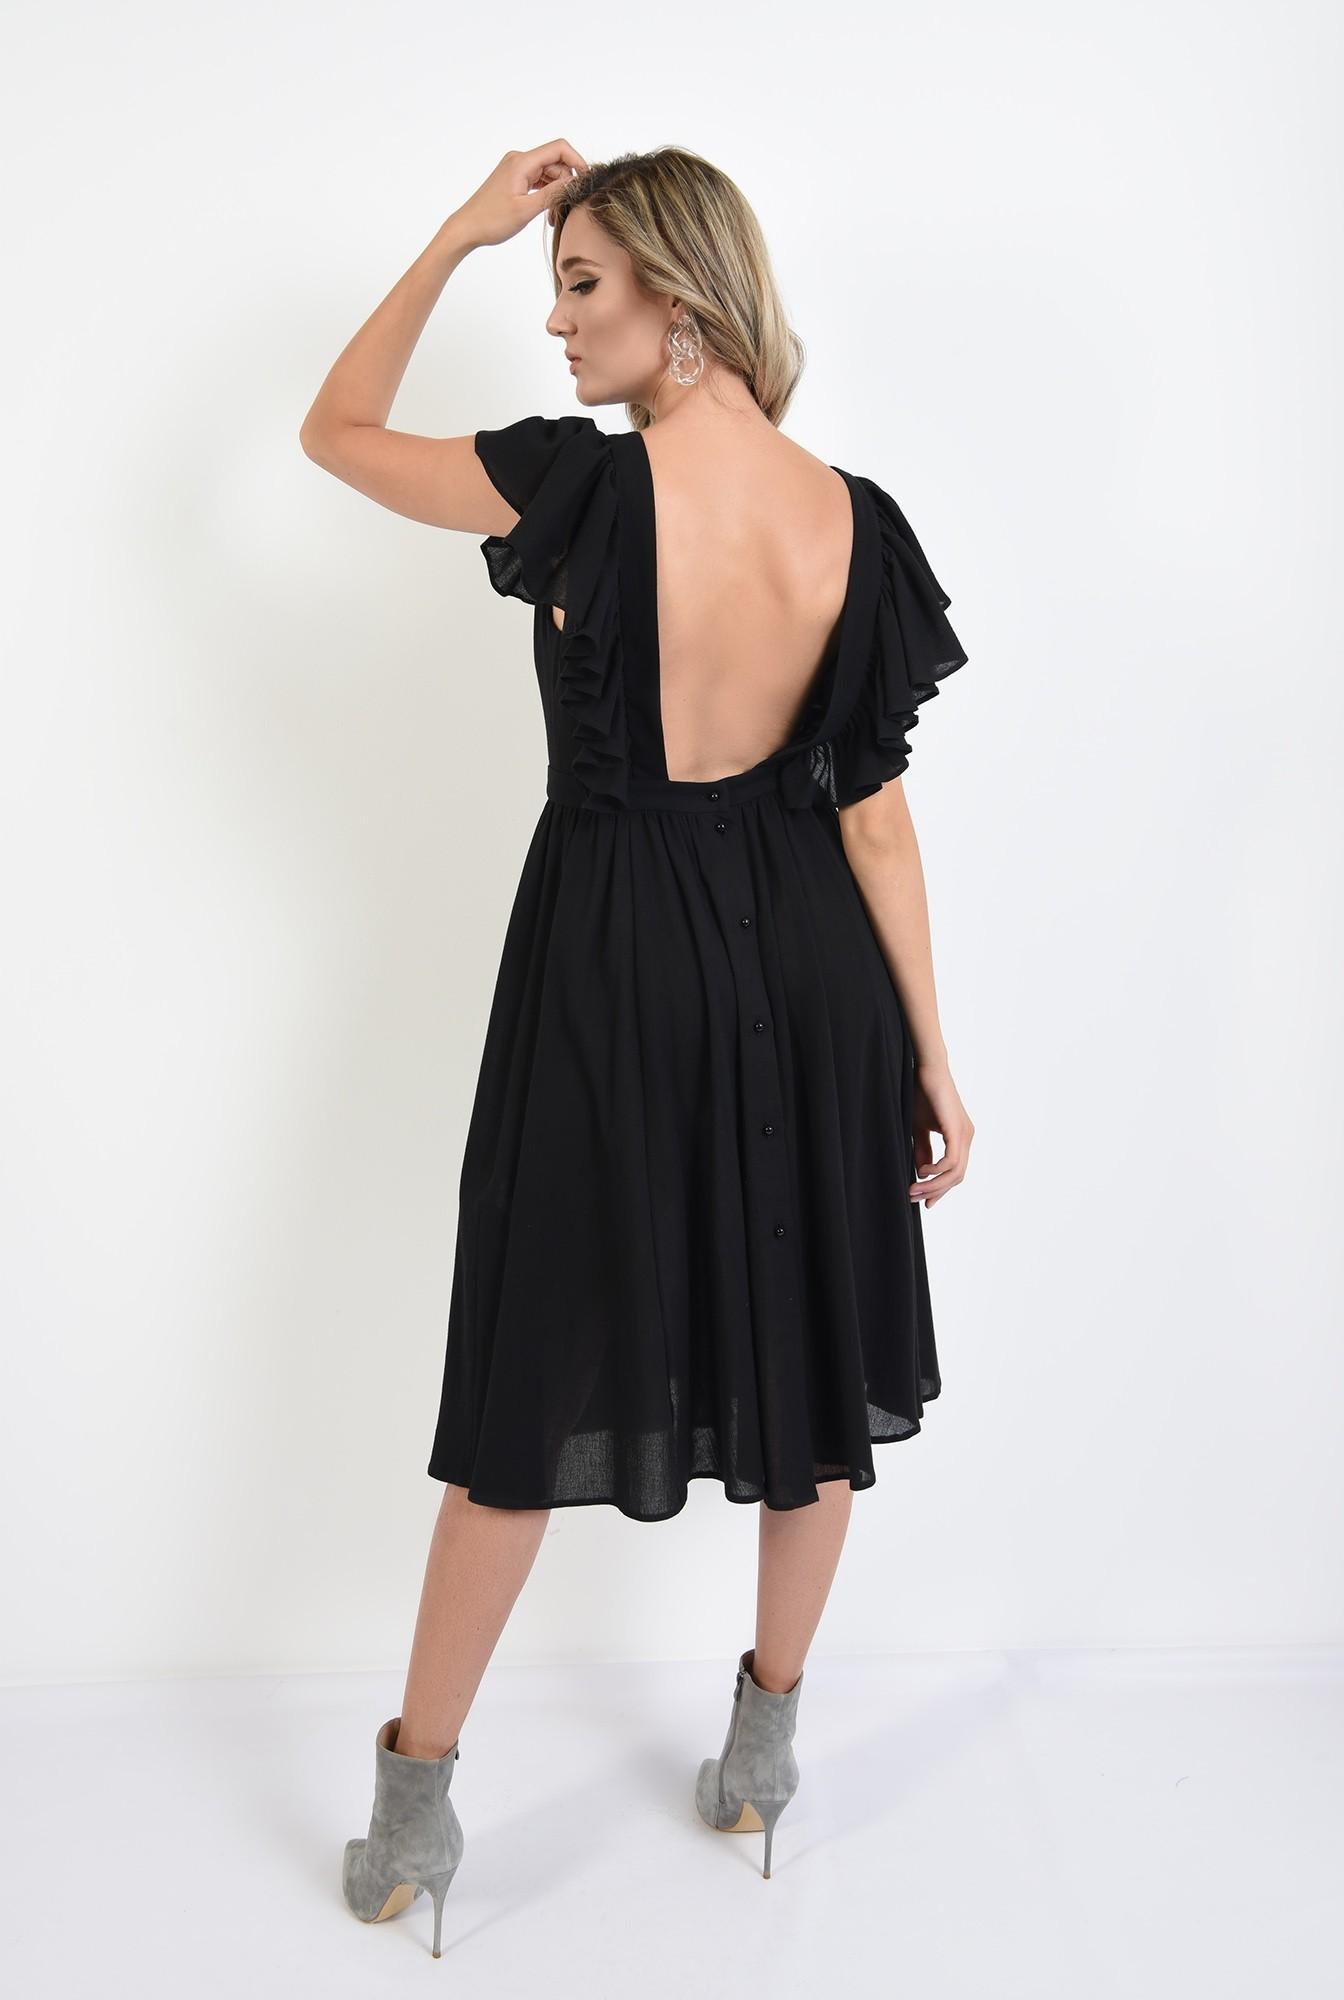 0 - 360 - rochie neagra, cu spate gol, evazata, midi, Poema